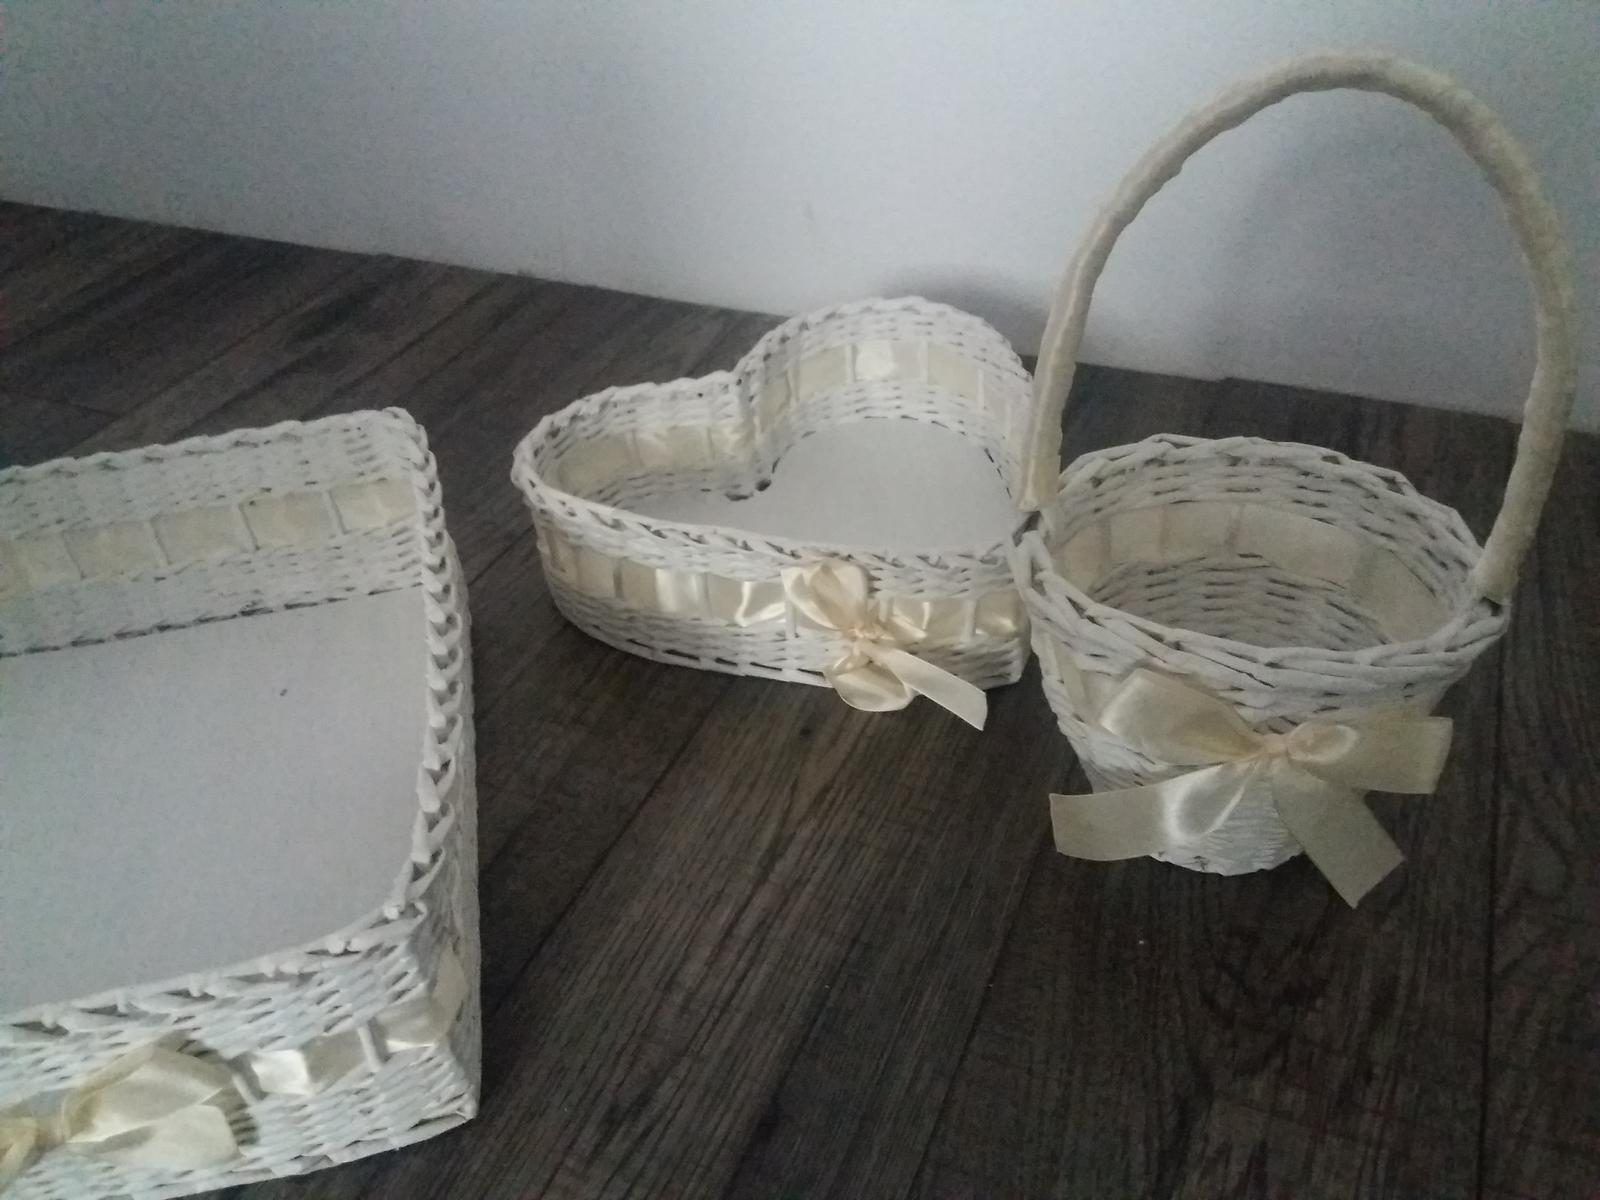 svadobné košíky na pierka/zákusky/lupene - Obrázok č. 4